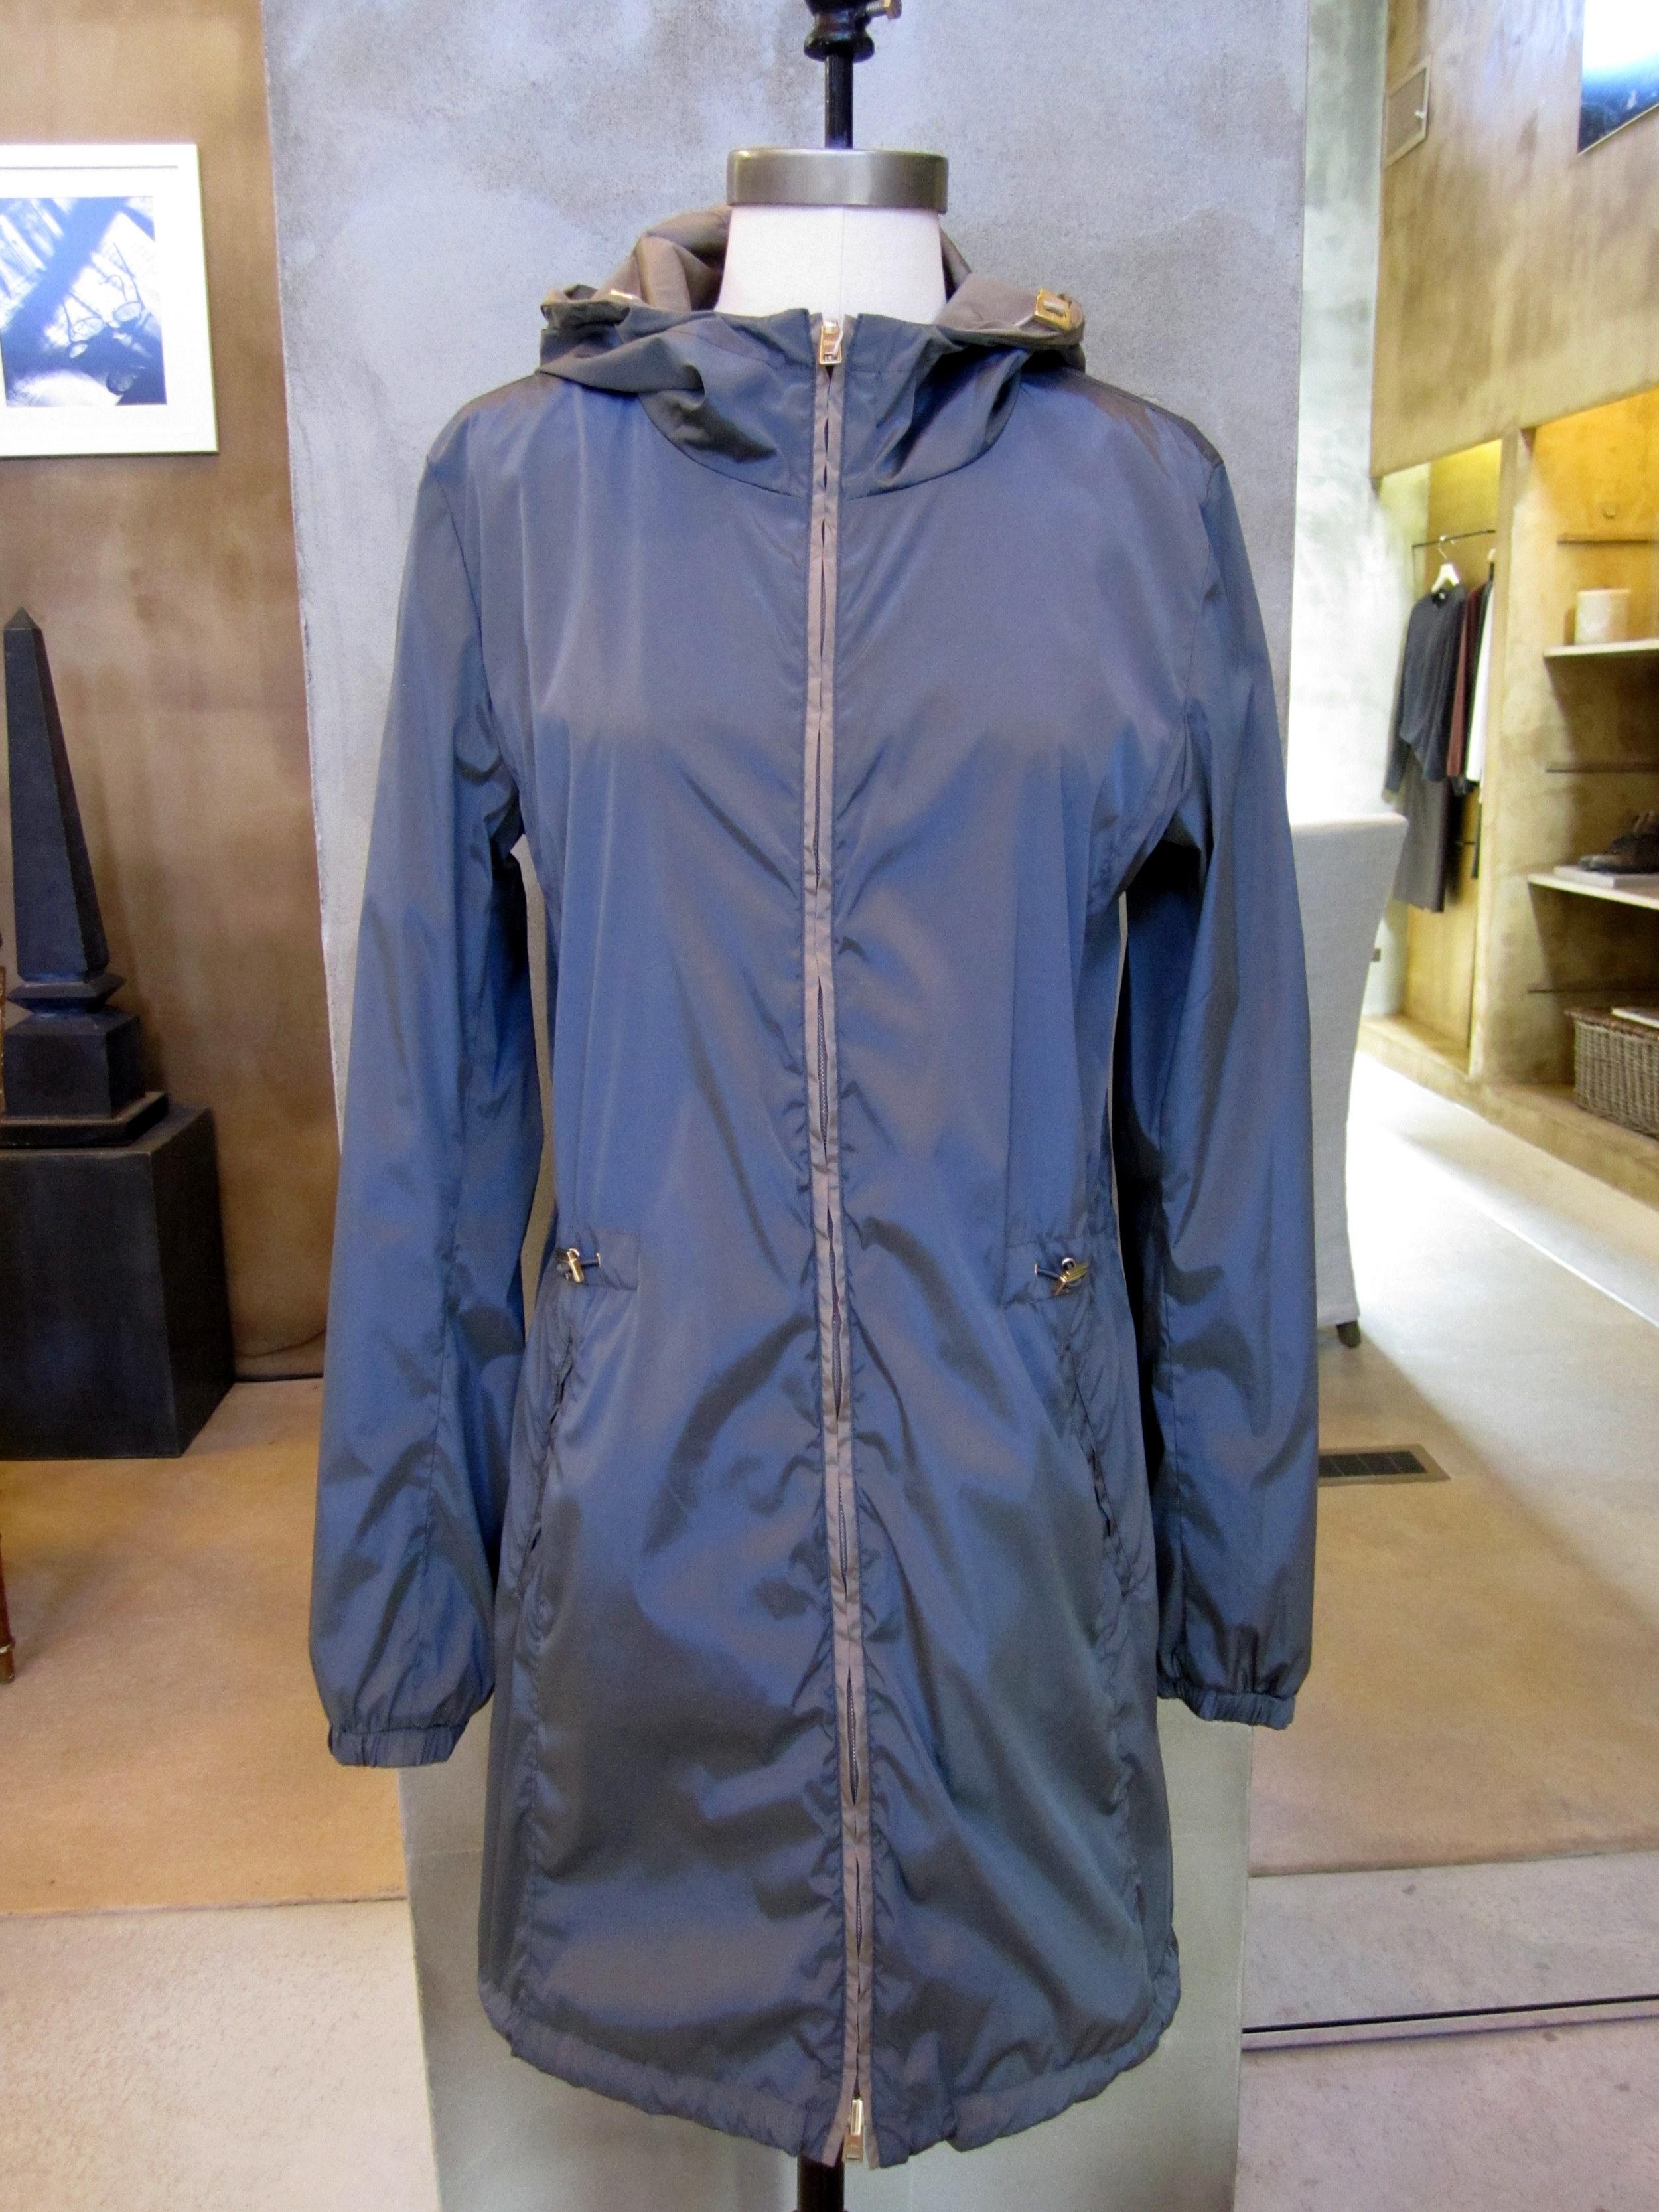 Herno Reversible Nylon Raincoat with Hood / Reverse Side. Dark Grey.